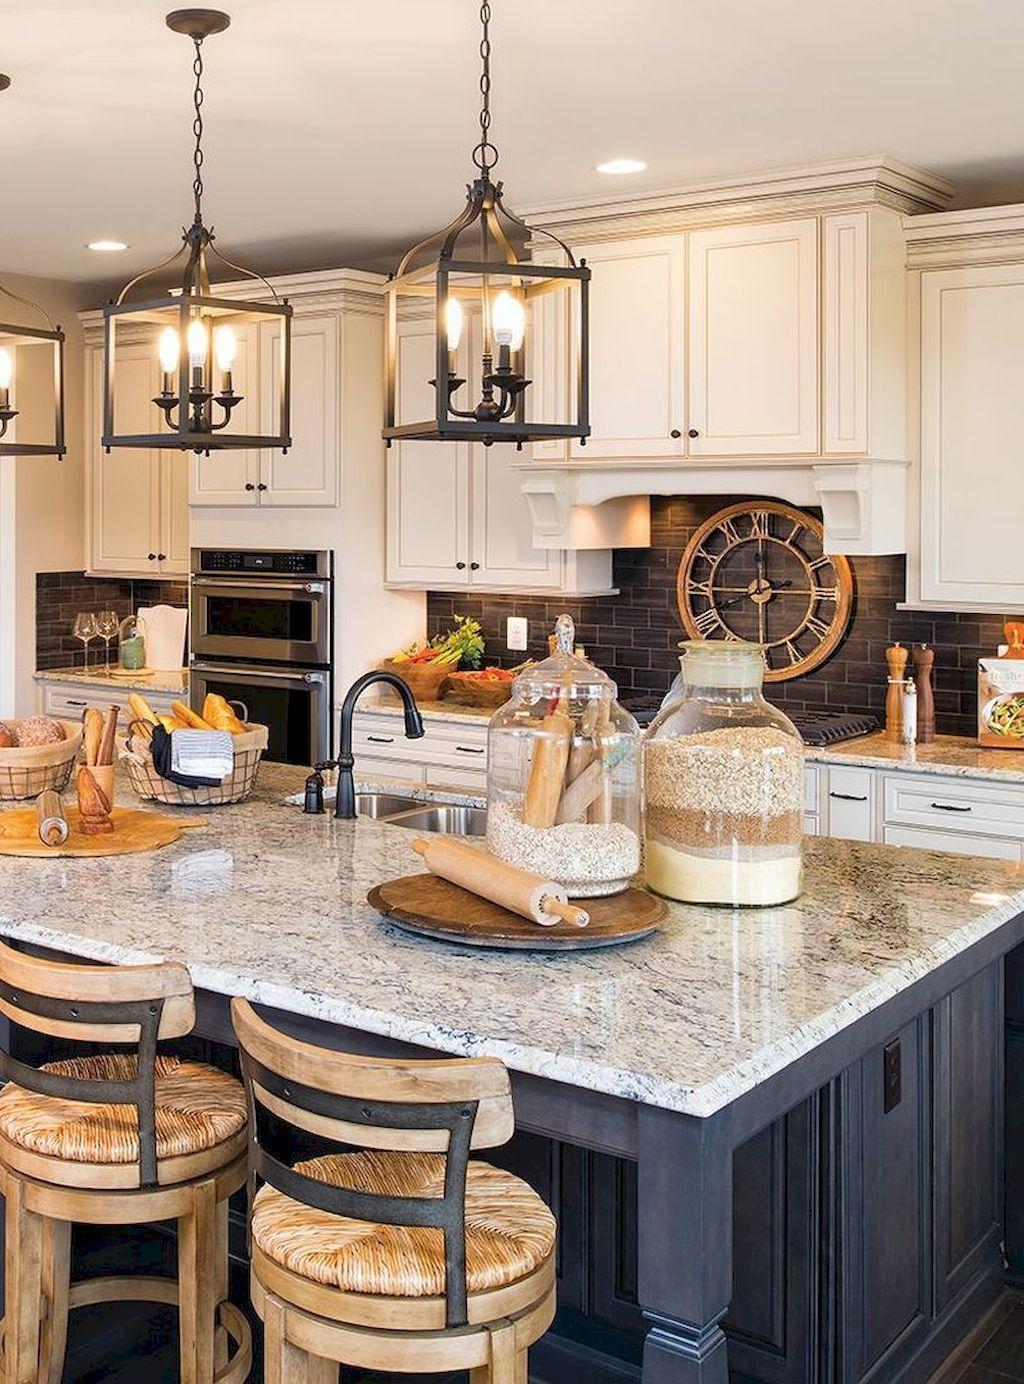 90 Rustic Kitchen Cabinets Farmhouse Style Ideas (86 ... on Farmhouse Rustic Kitchen Ideas  id=60153